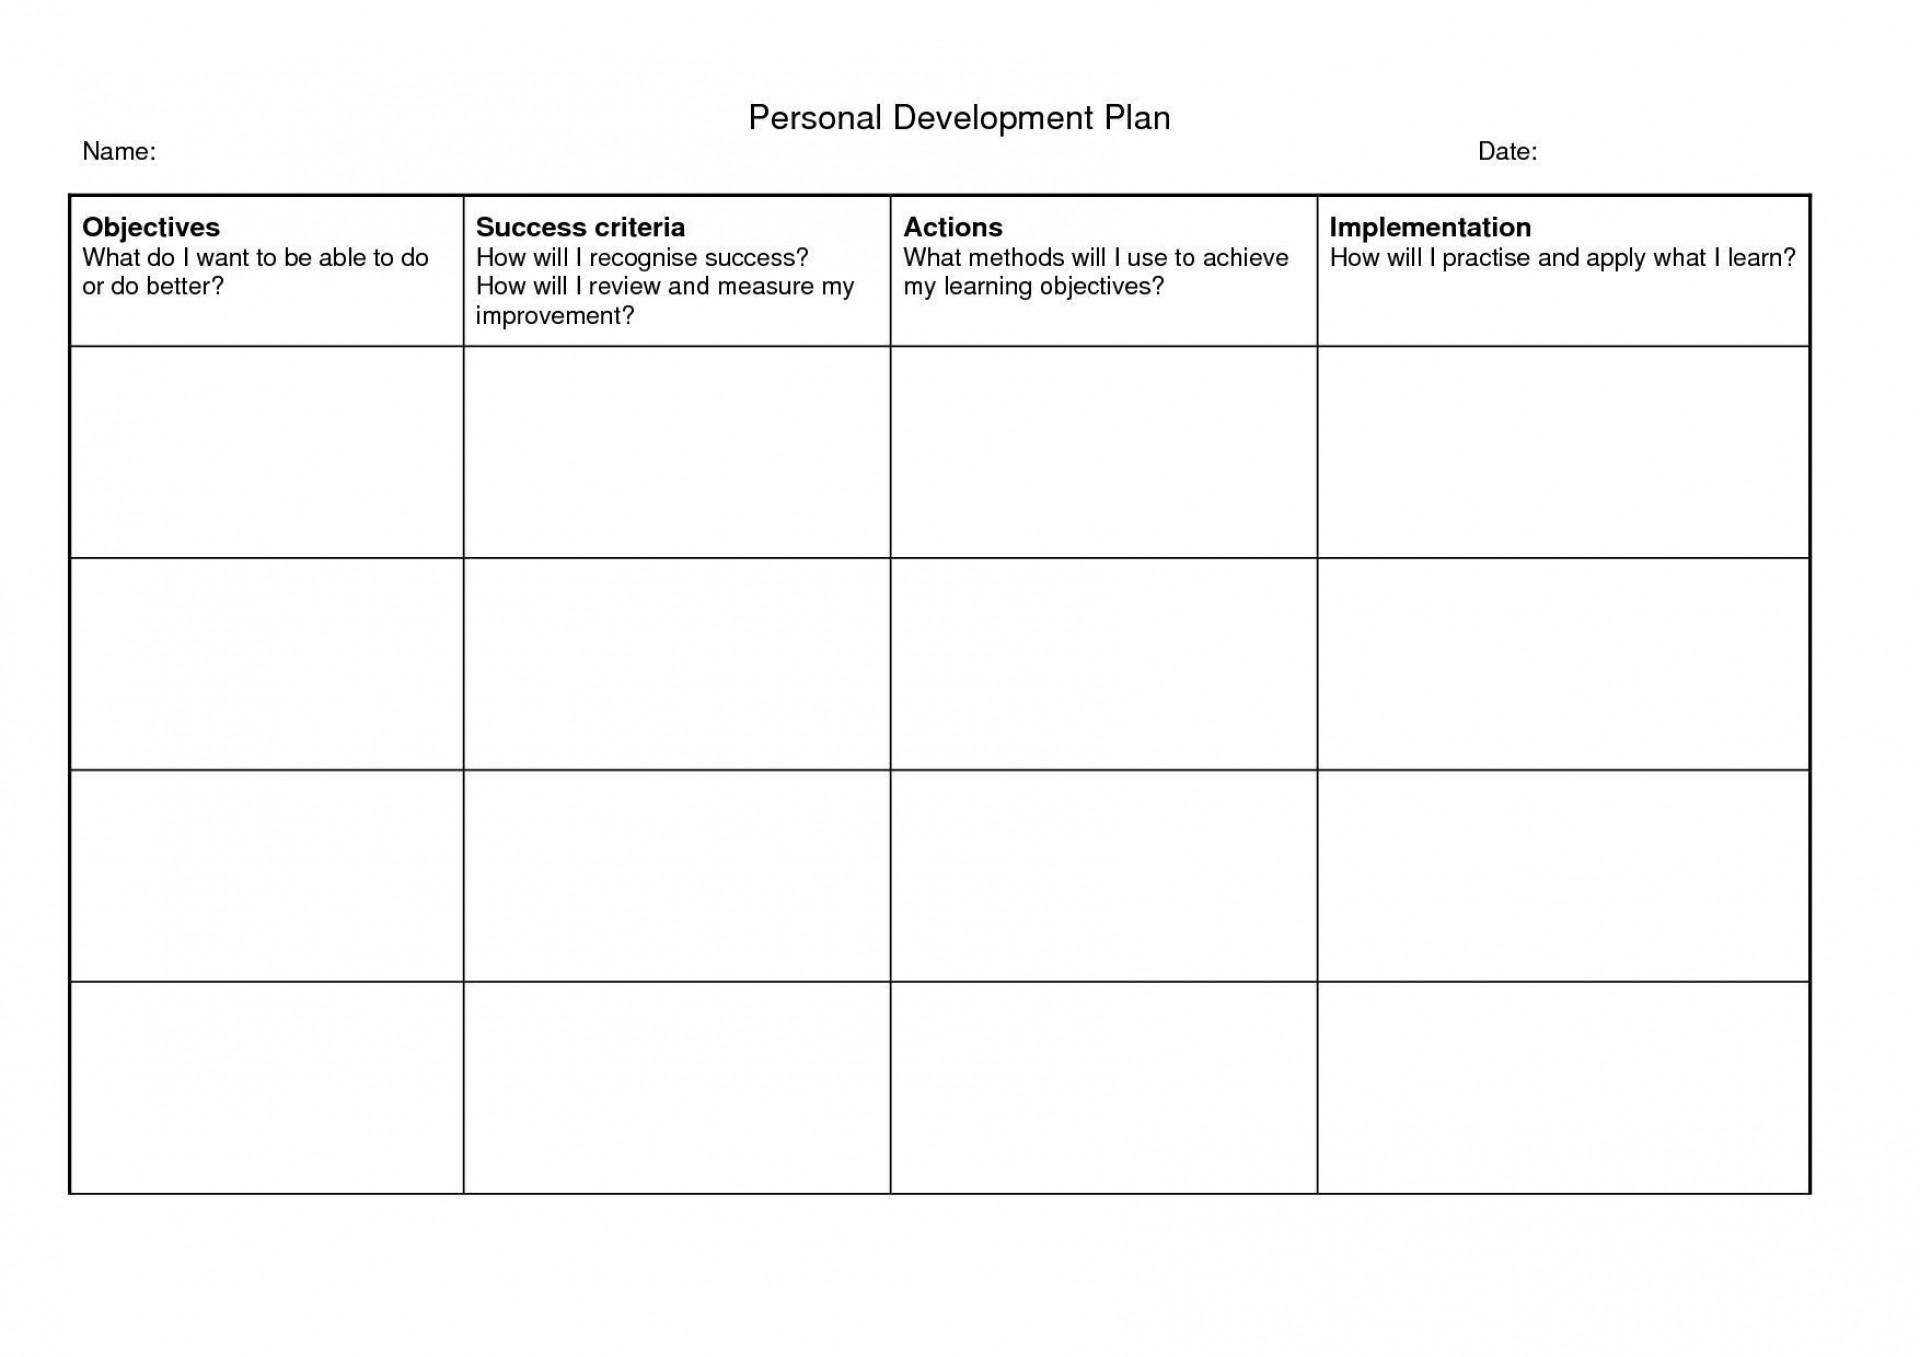 002 Frightening Professional Development Plan Template Word Design 1920